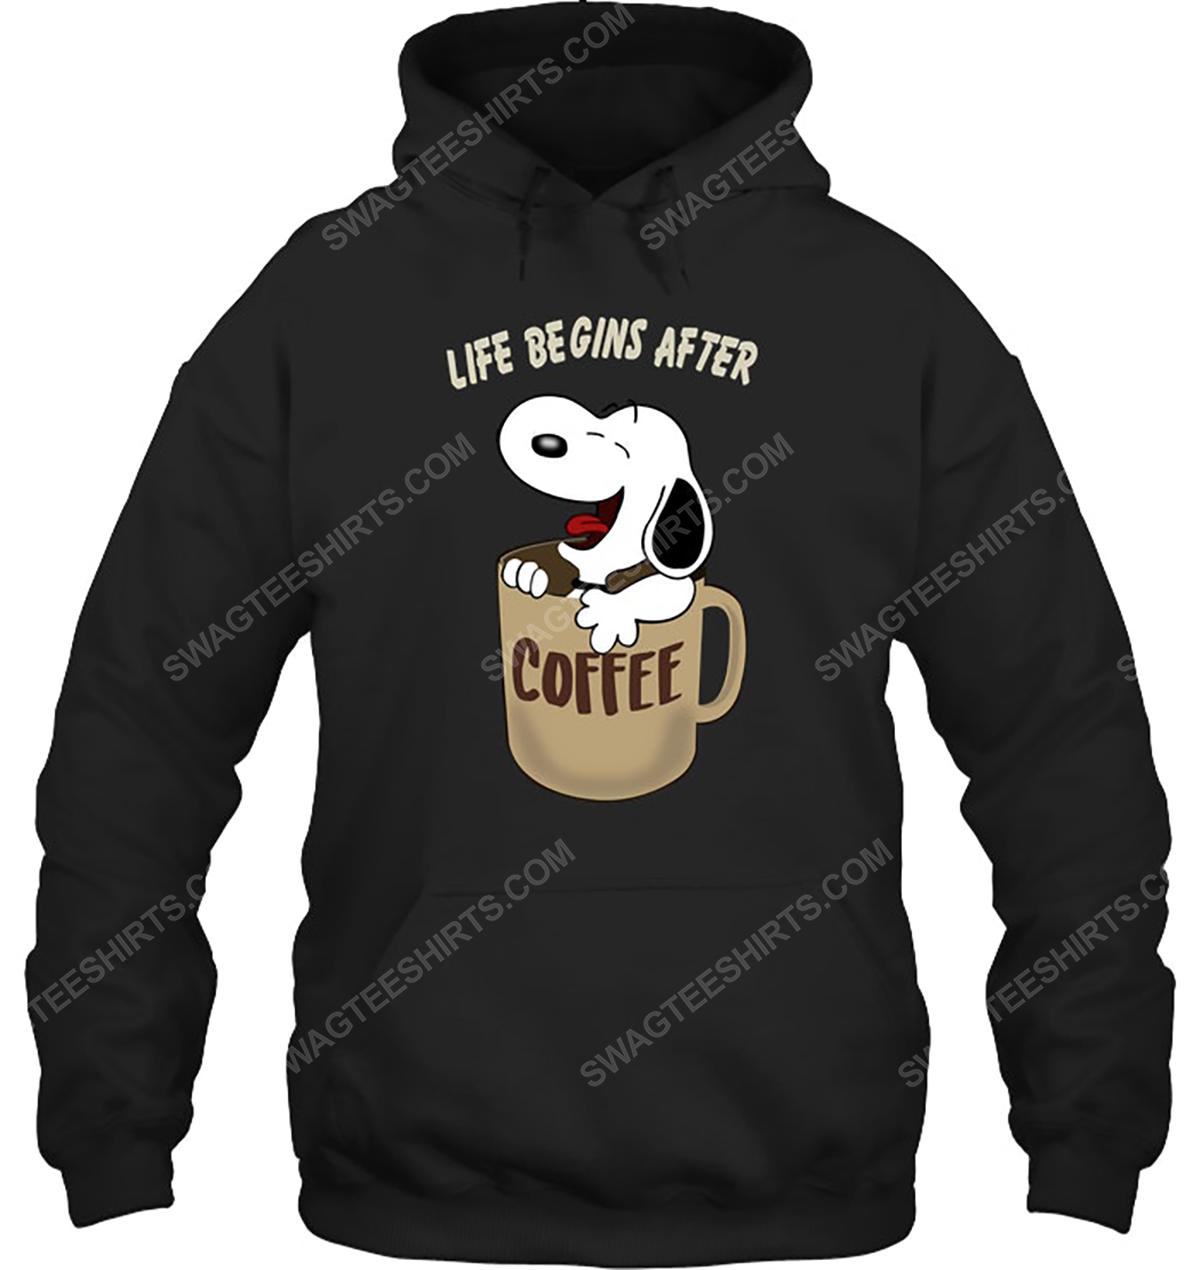 The peanuts snoopy life begins after coffee hoodie 1